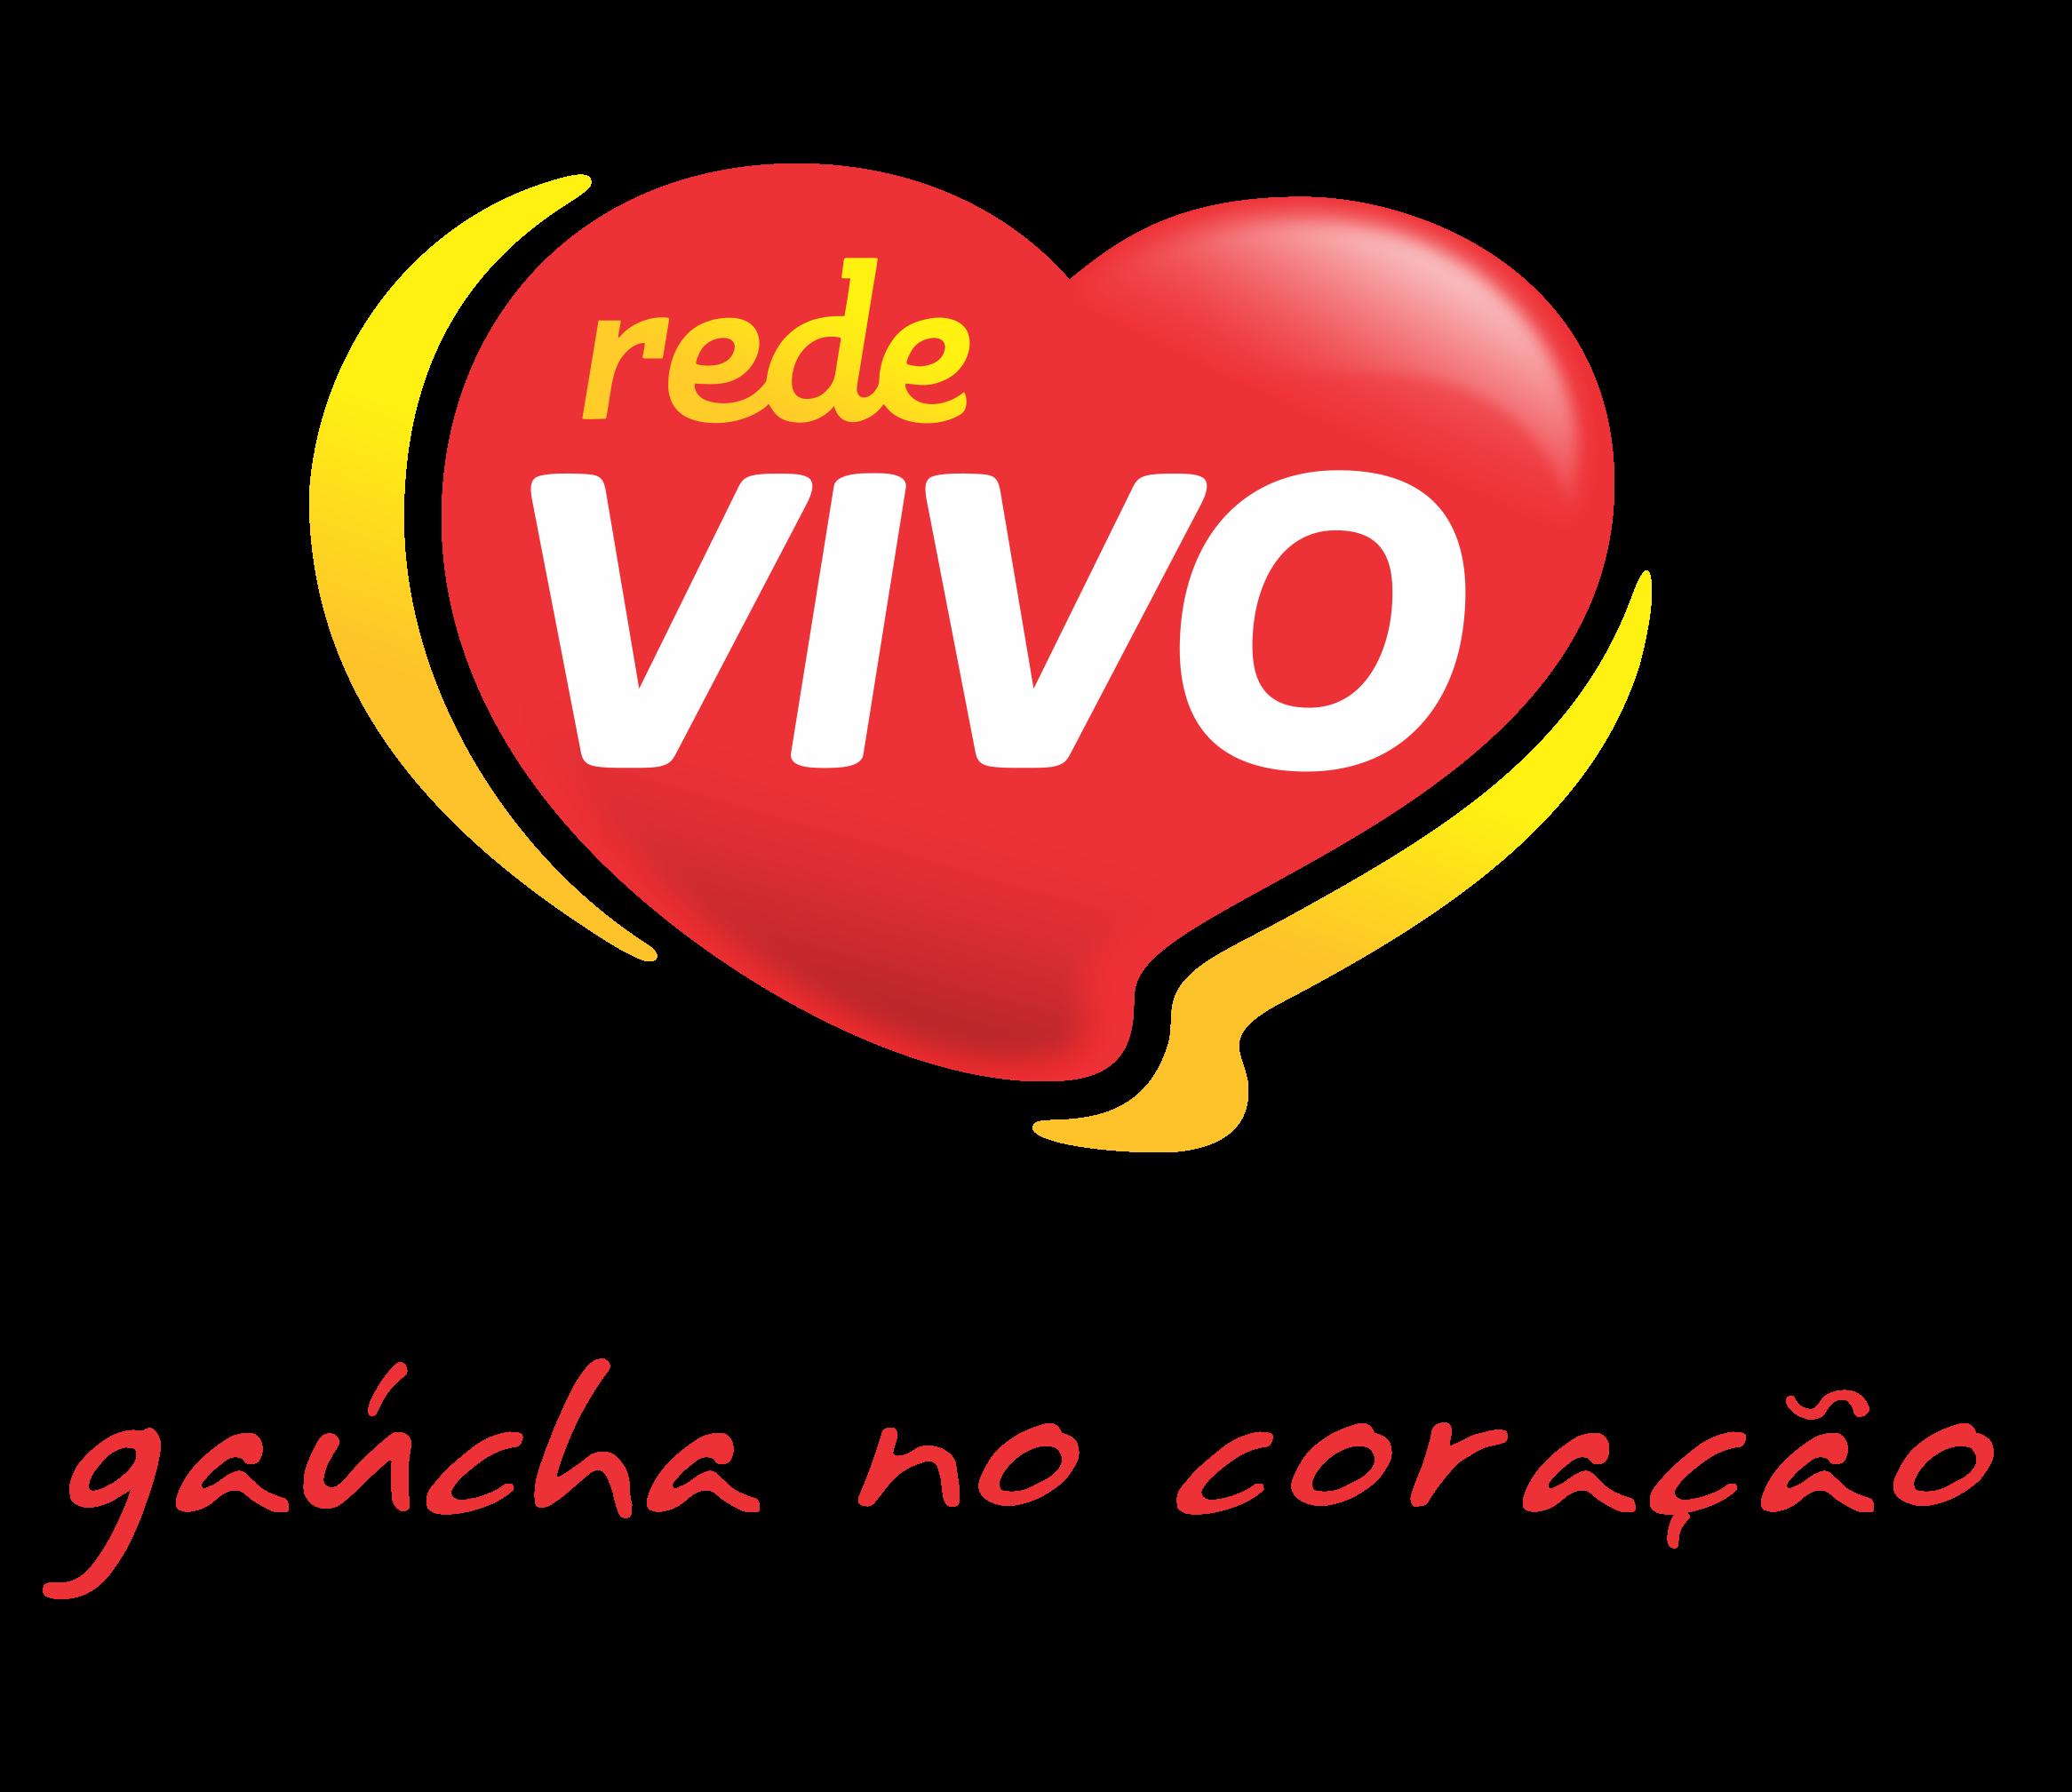 REDE VIVO